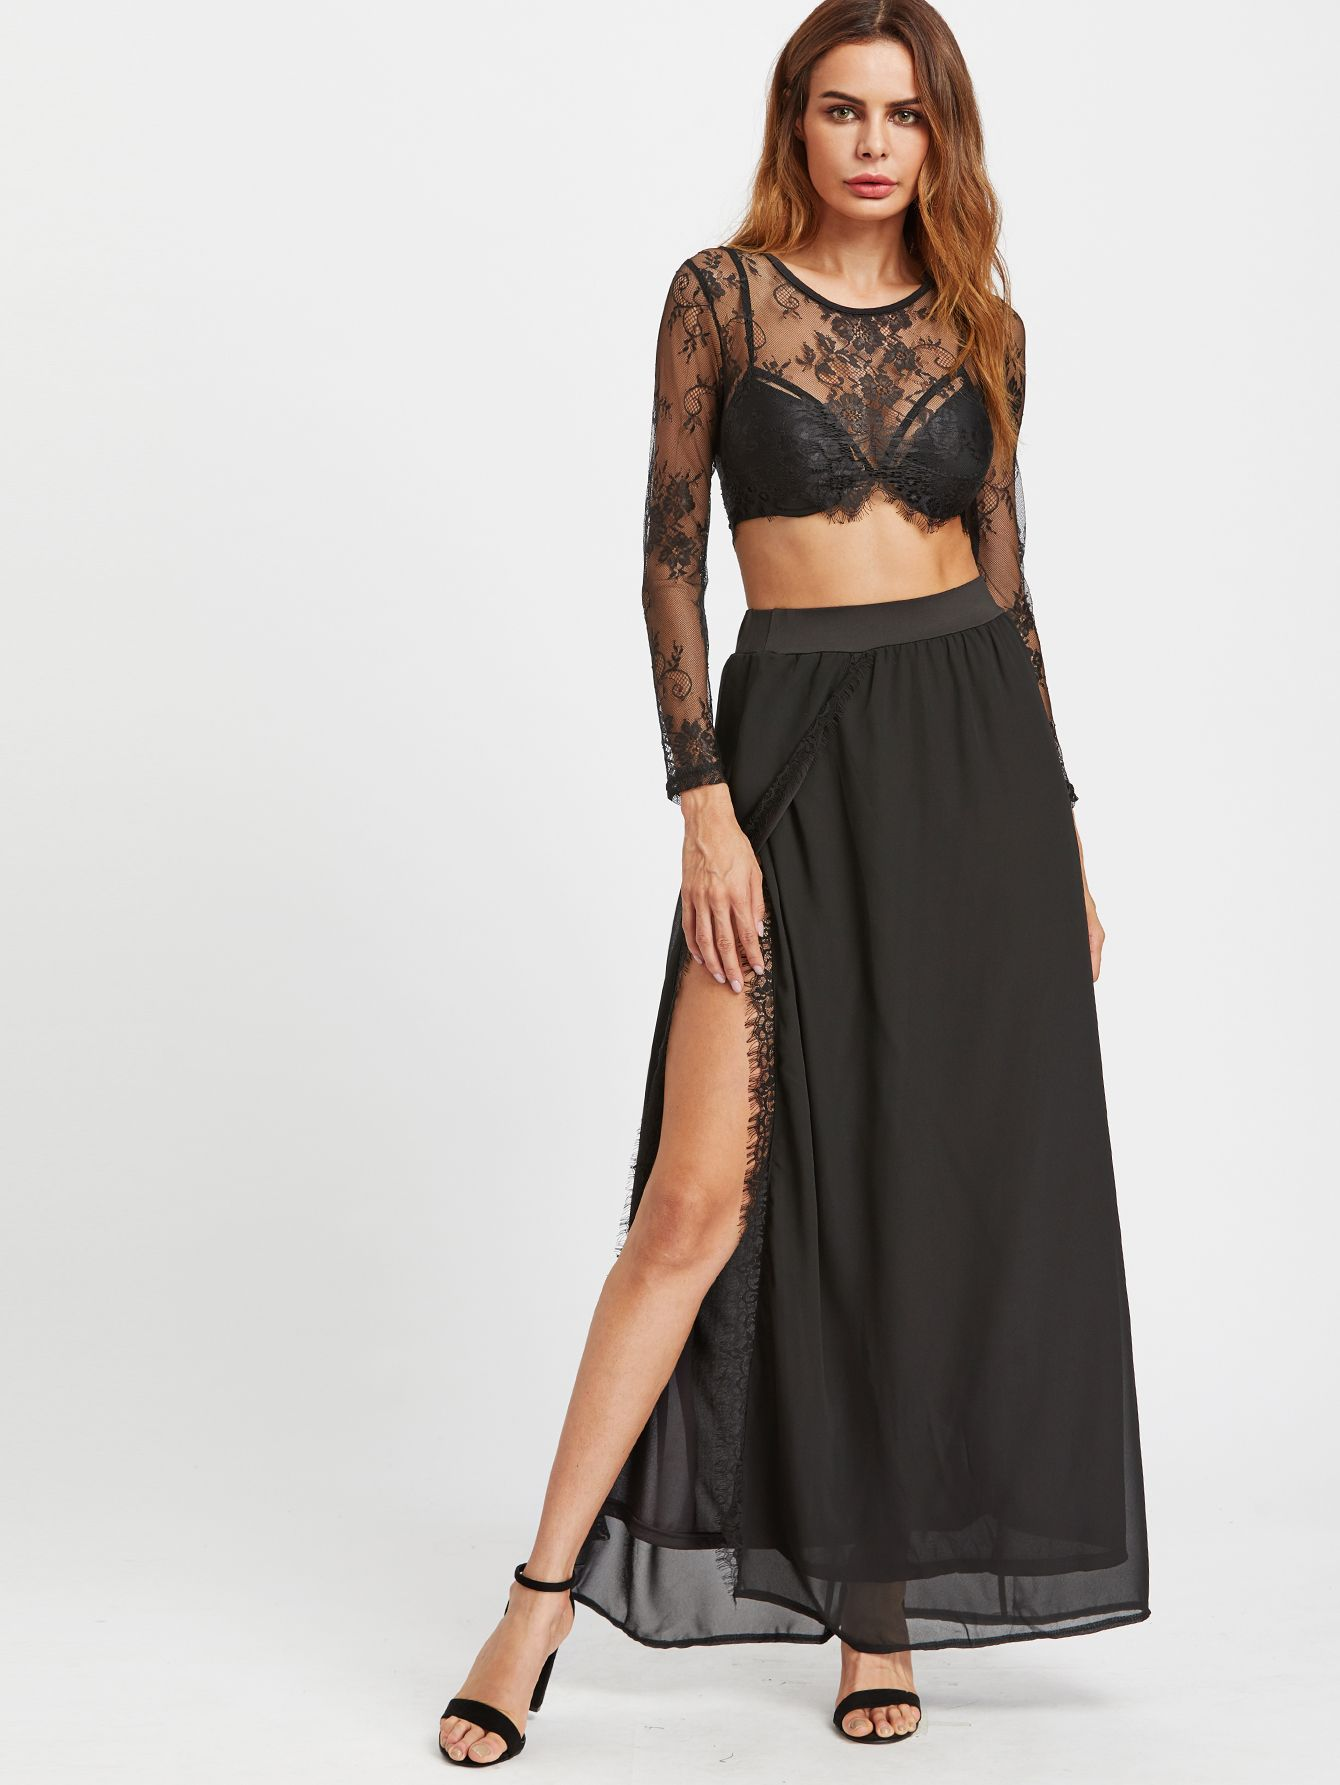 de3d6abd6b Shop Sheer Eyelash Lace Crop Top With Slit Side Skirt online. SheIn offers  Sheer Eyelash Lace Crop Top With Slit Side Skirt & more to fit your  fashionable ...